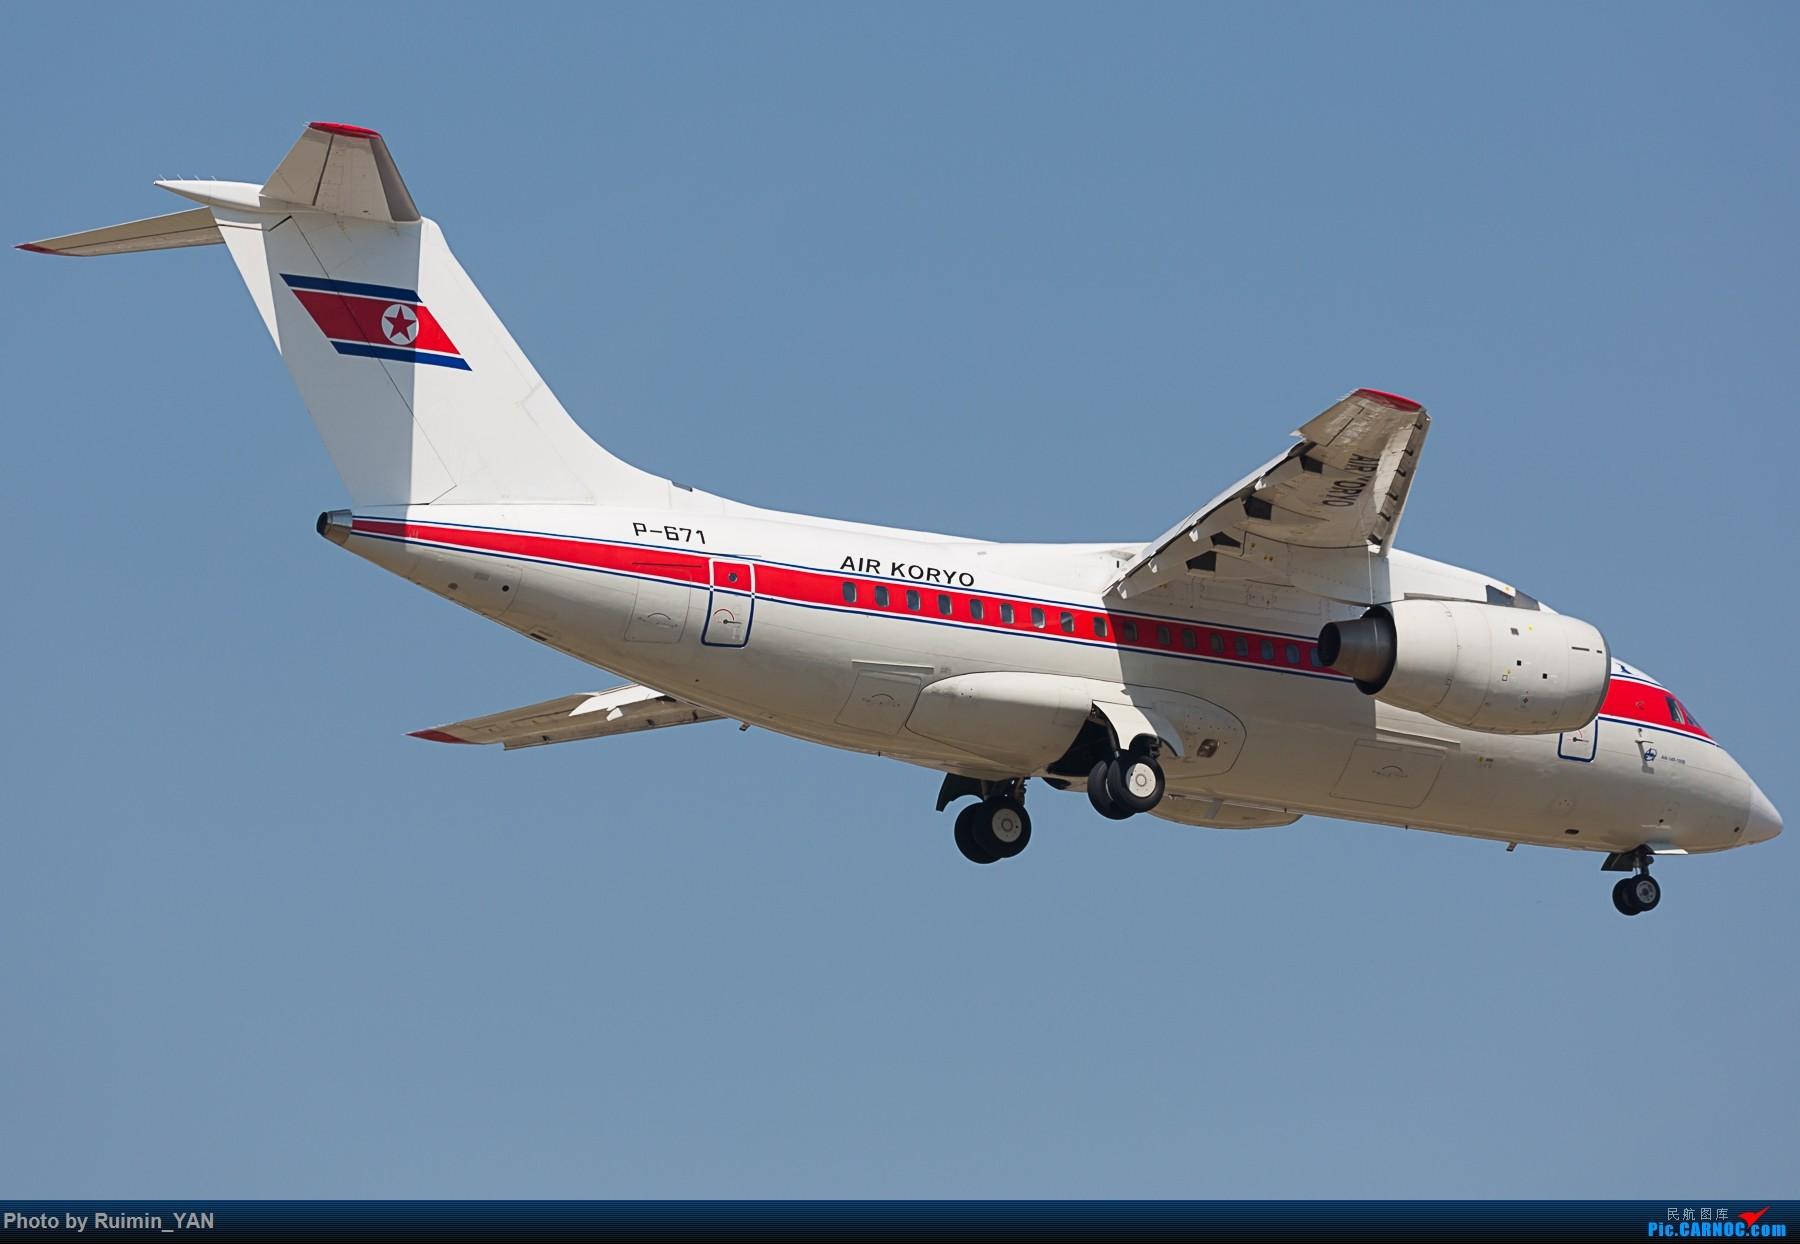 Re:【PEK】朝鲜高丽航空(JS, Air Koryo) P-671 安东诺夫 Antonov AN-148 ANTONOV AN-148 P-671 中国北京首都国际机场